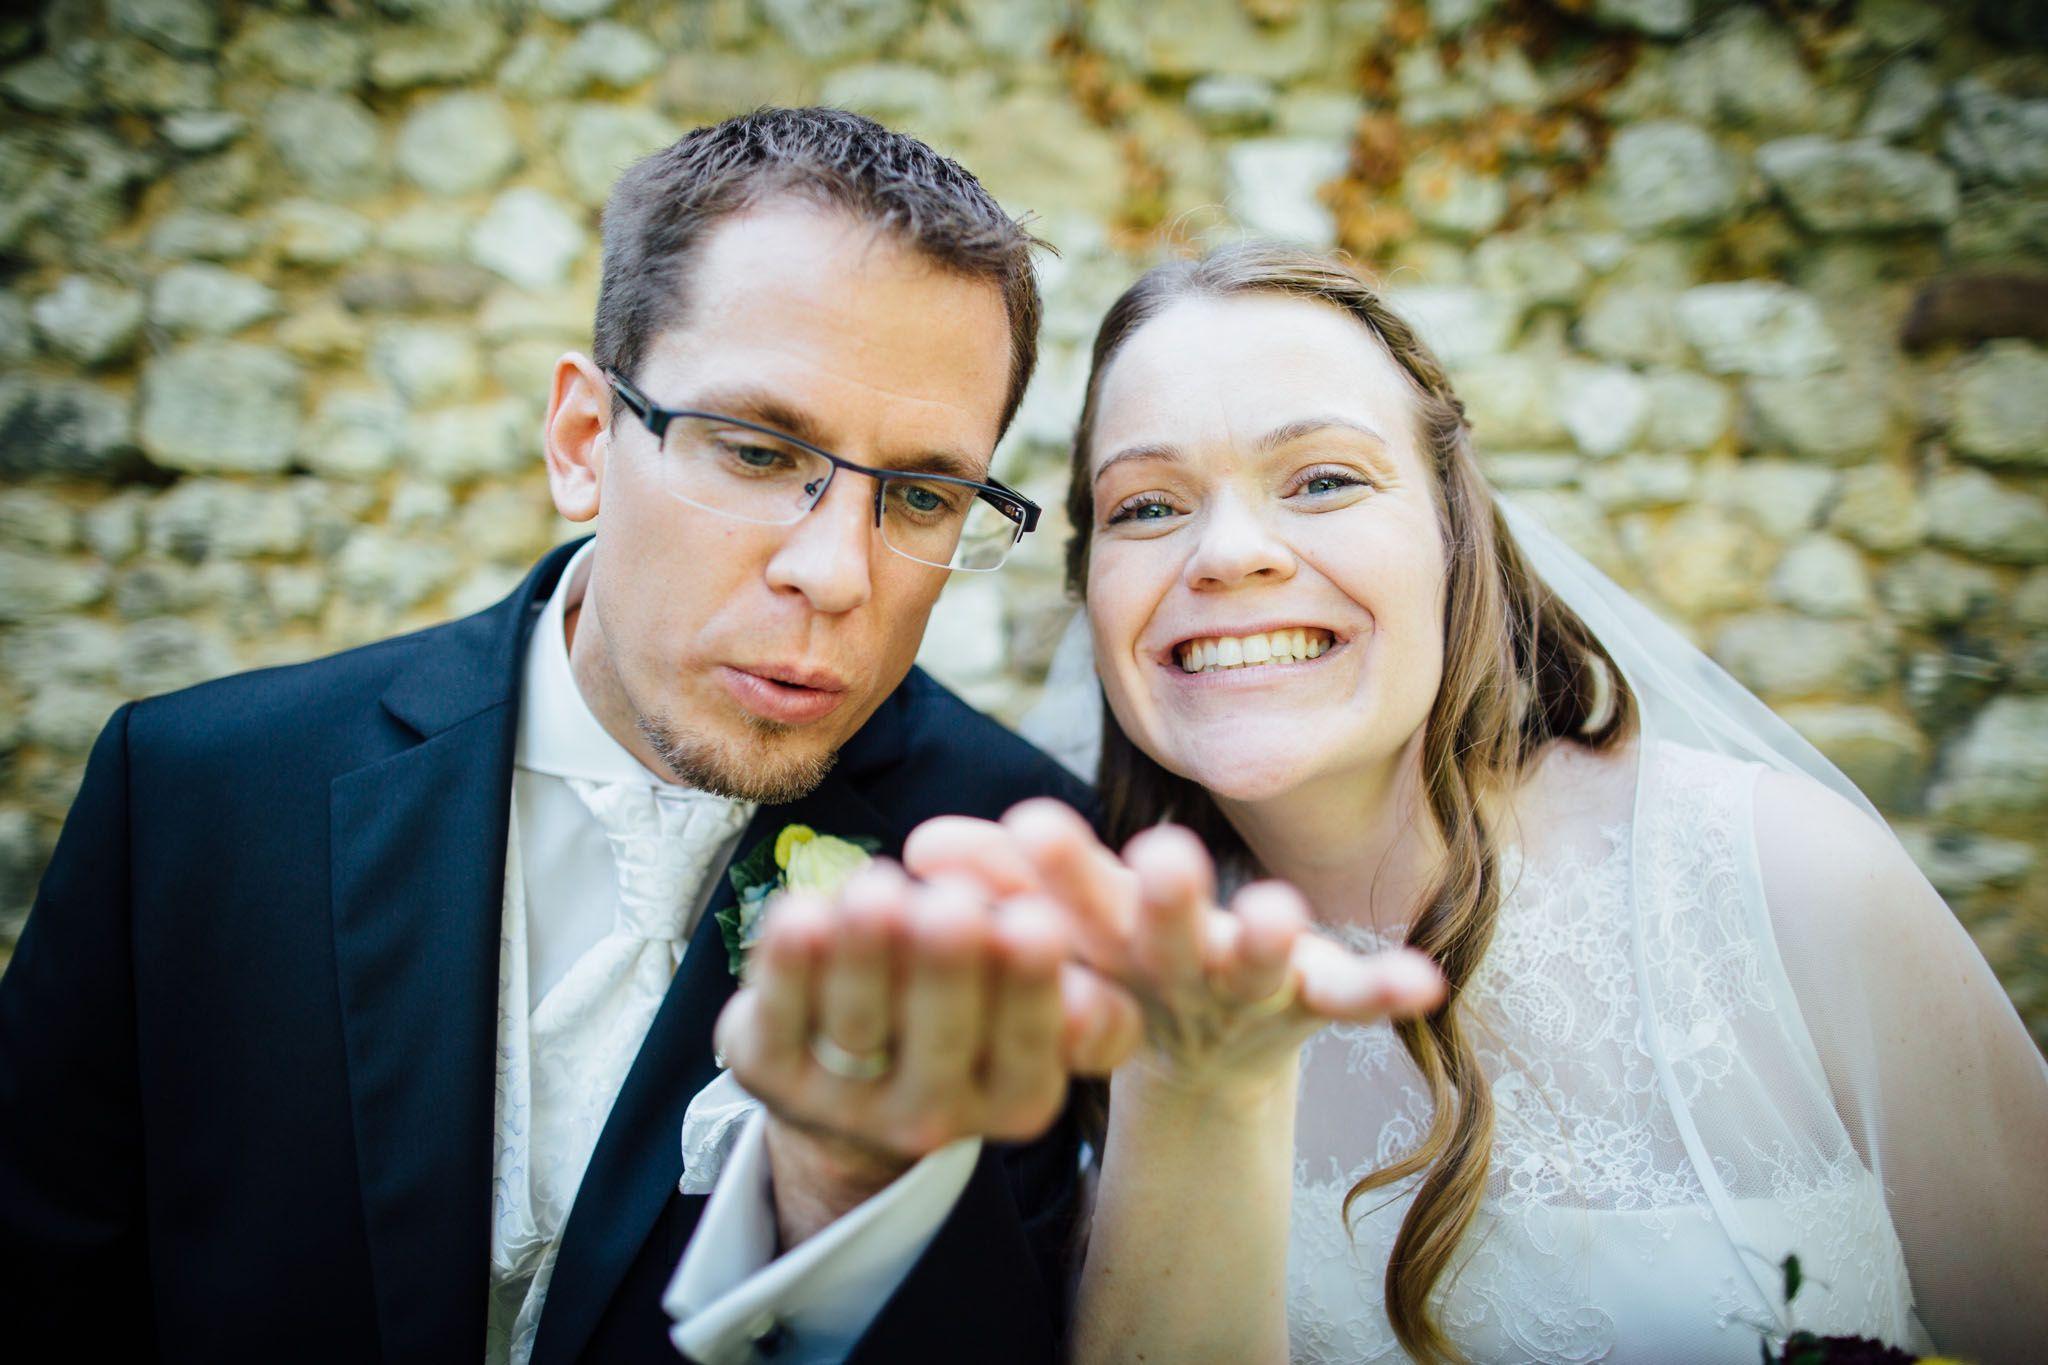 brautpaar-shooting-konfetti-fotograf